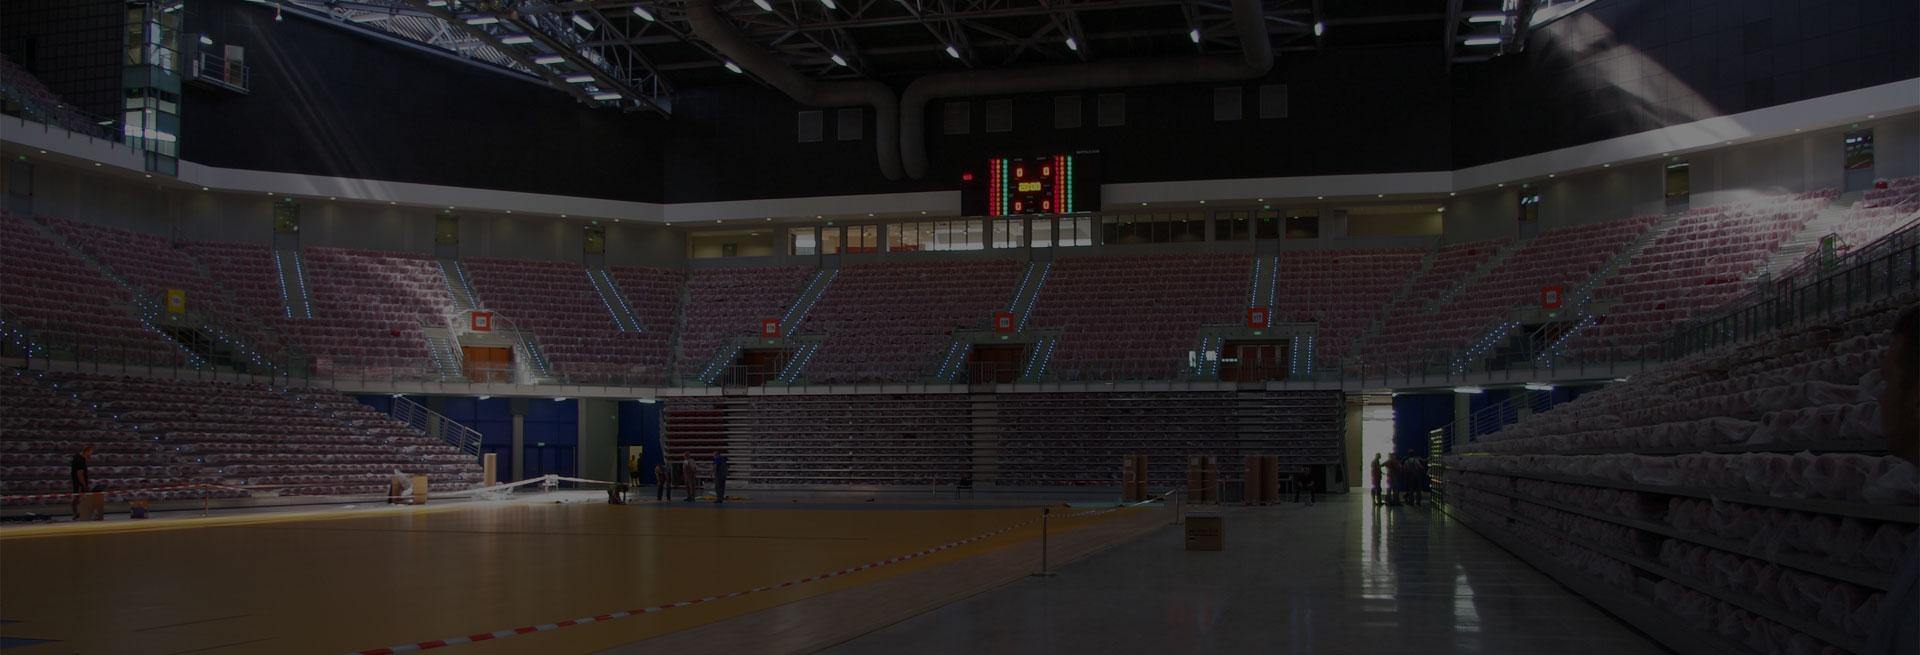 Арена Армеец София